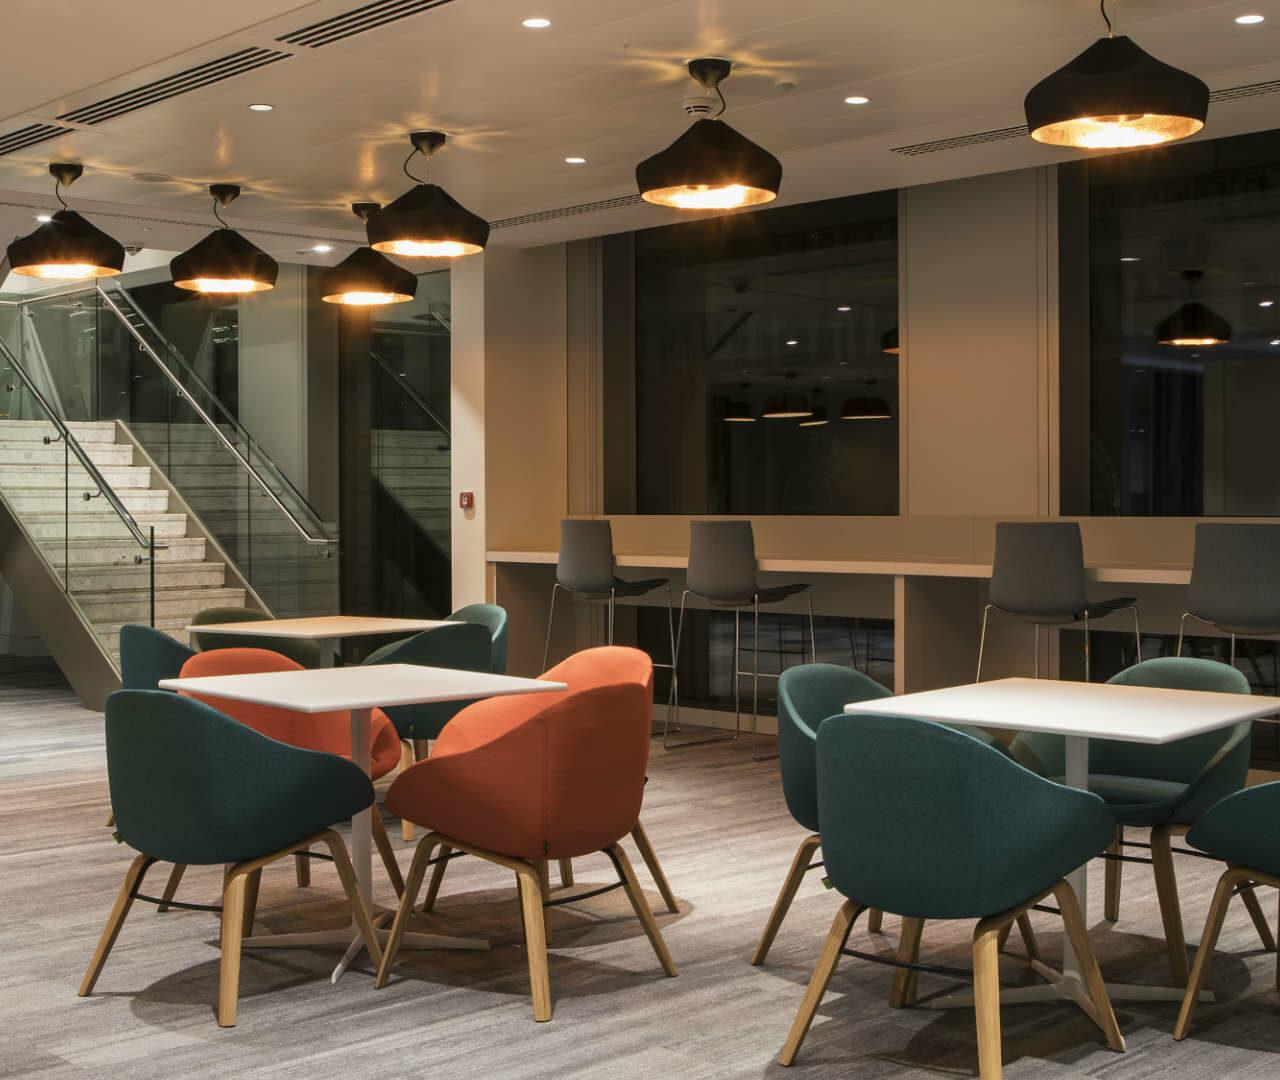 Lighting scheme meets WELL requirements – enhancing employee's wellbeing experience